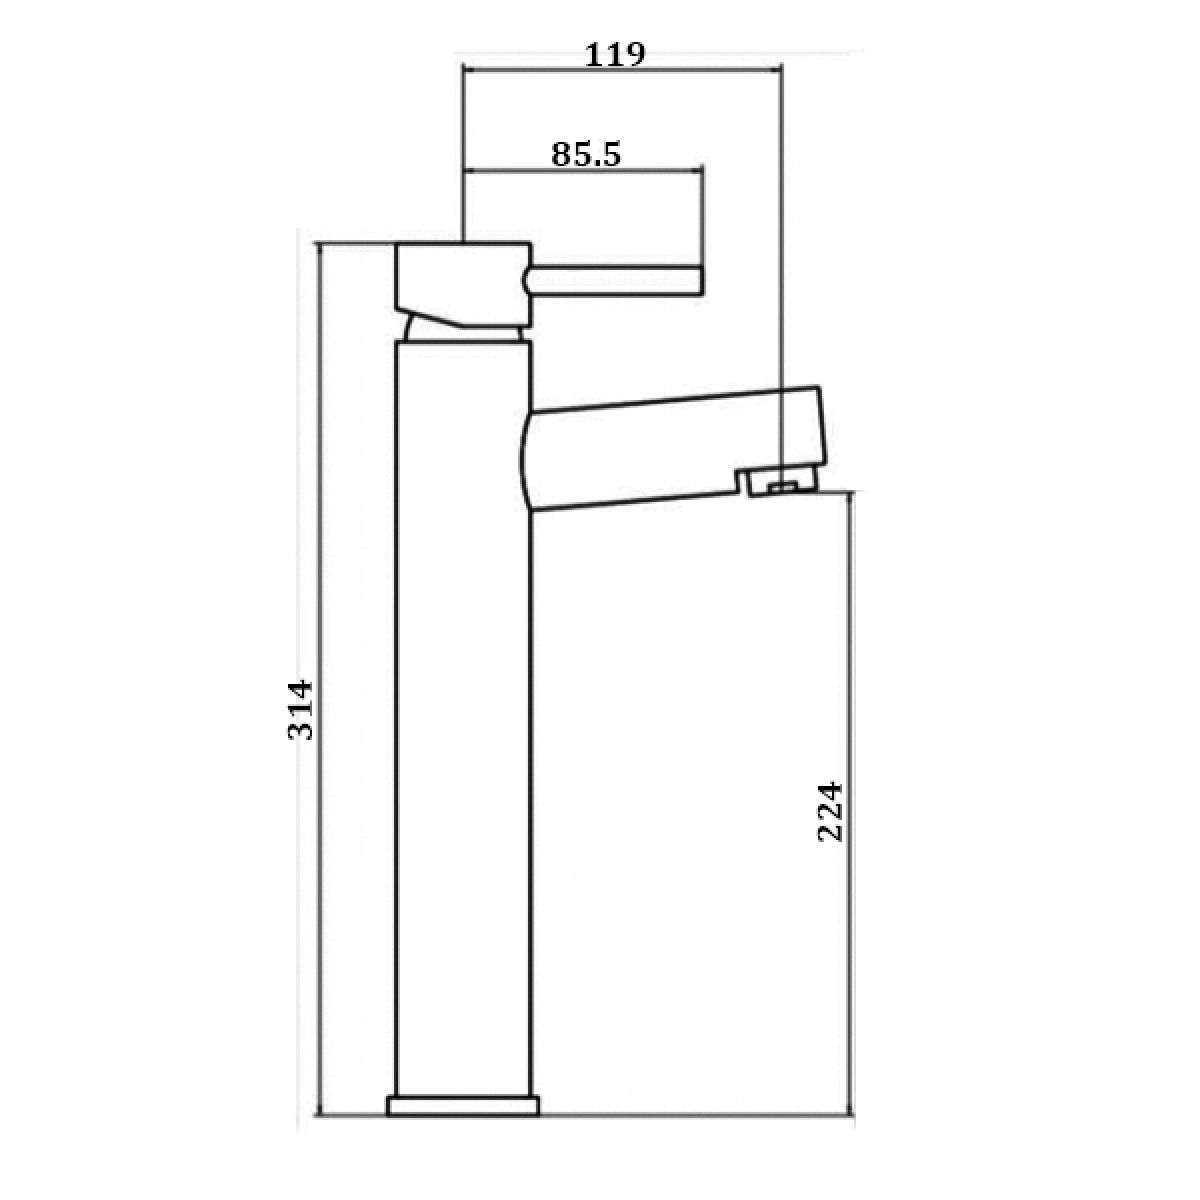 RAK Prima Chrome Tall Mono Basin Mixer Tap Measurements